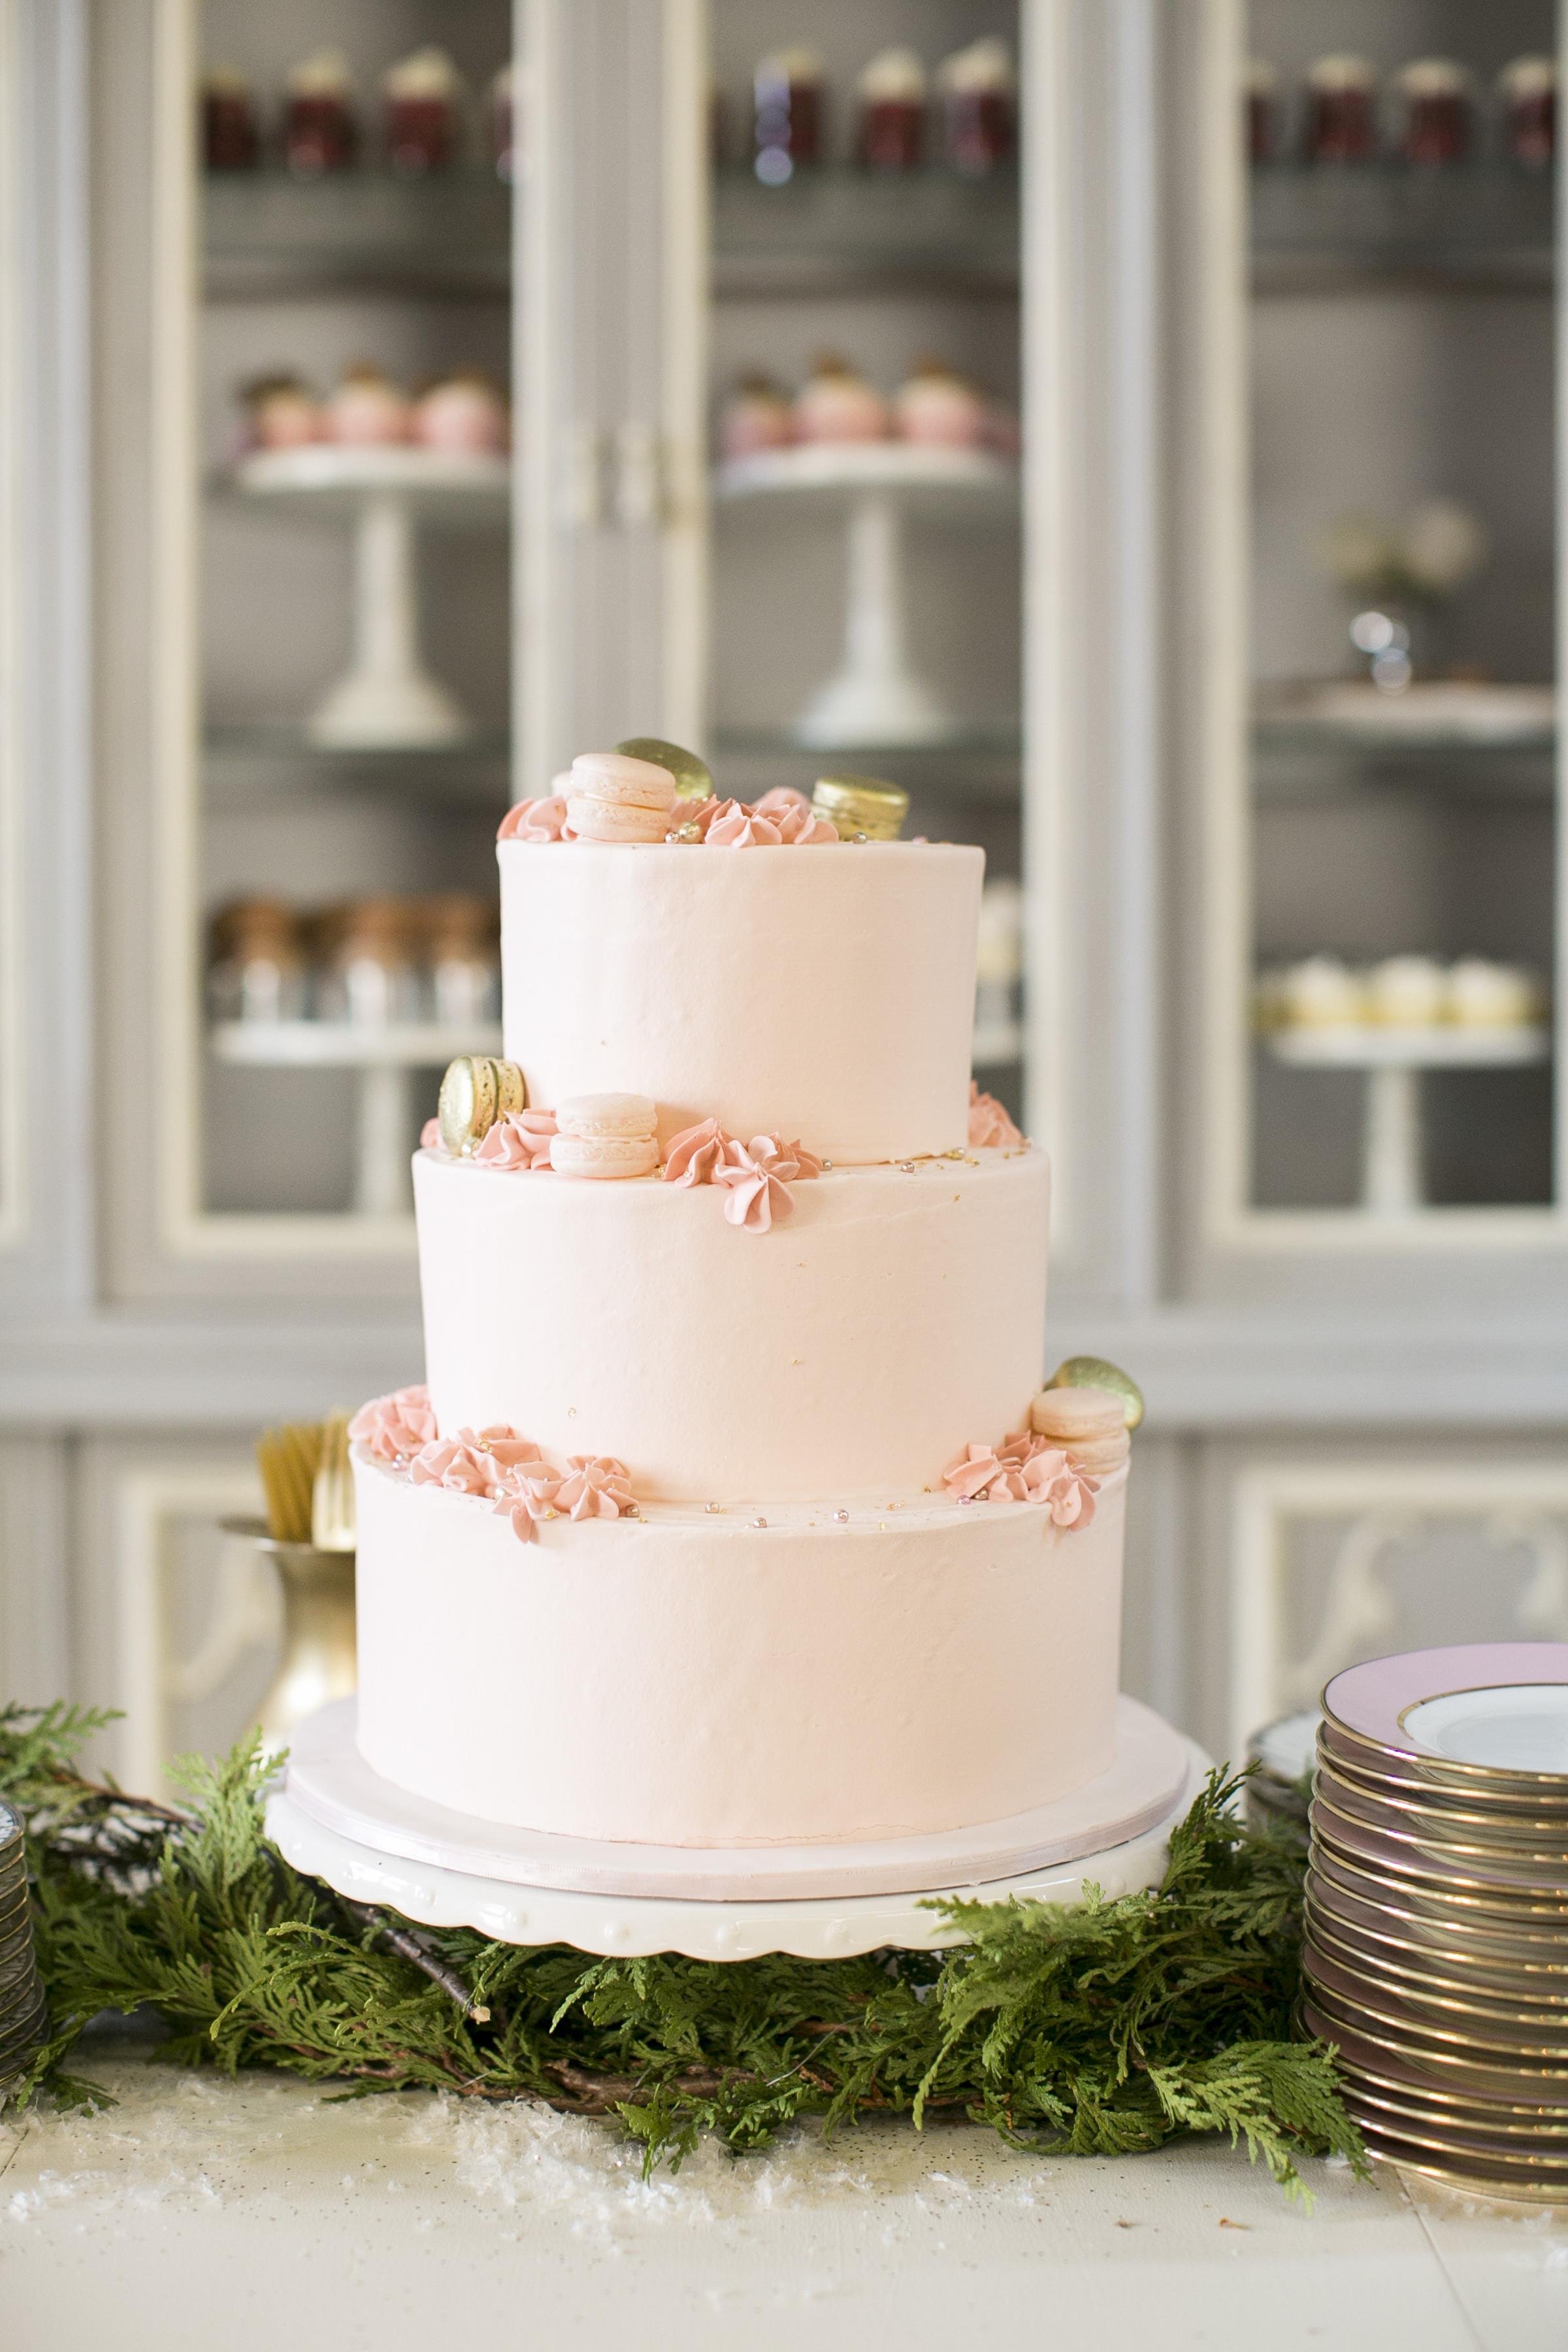 niagara-wedding-cakes-sweet-celebrations-custom-minimalistic-cakes-009.JPG